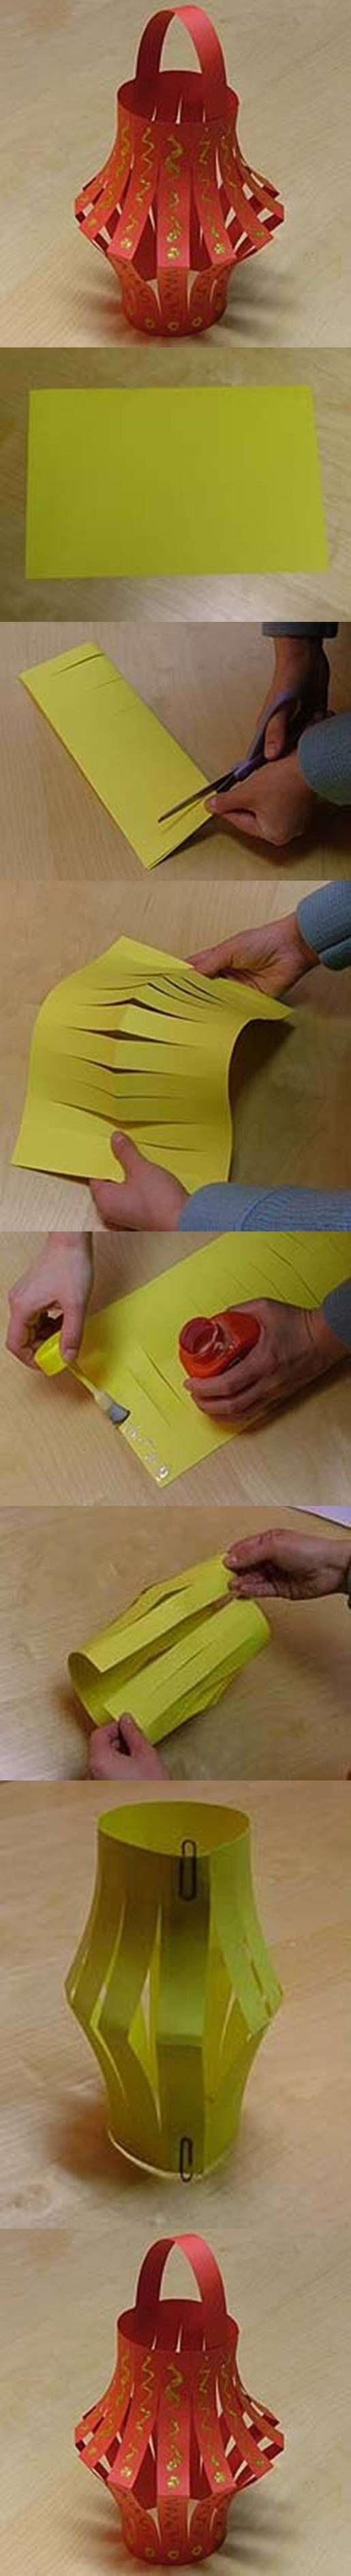 Paper lantern; construction paper; Disney, movie, around the world theme